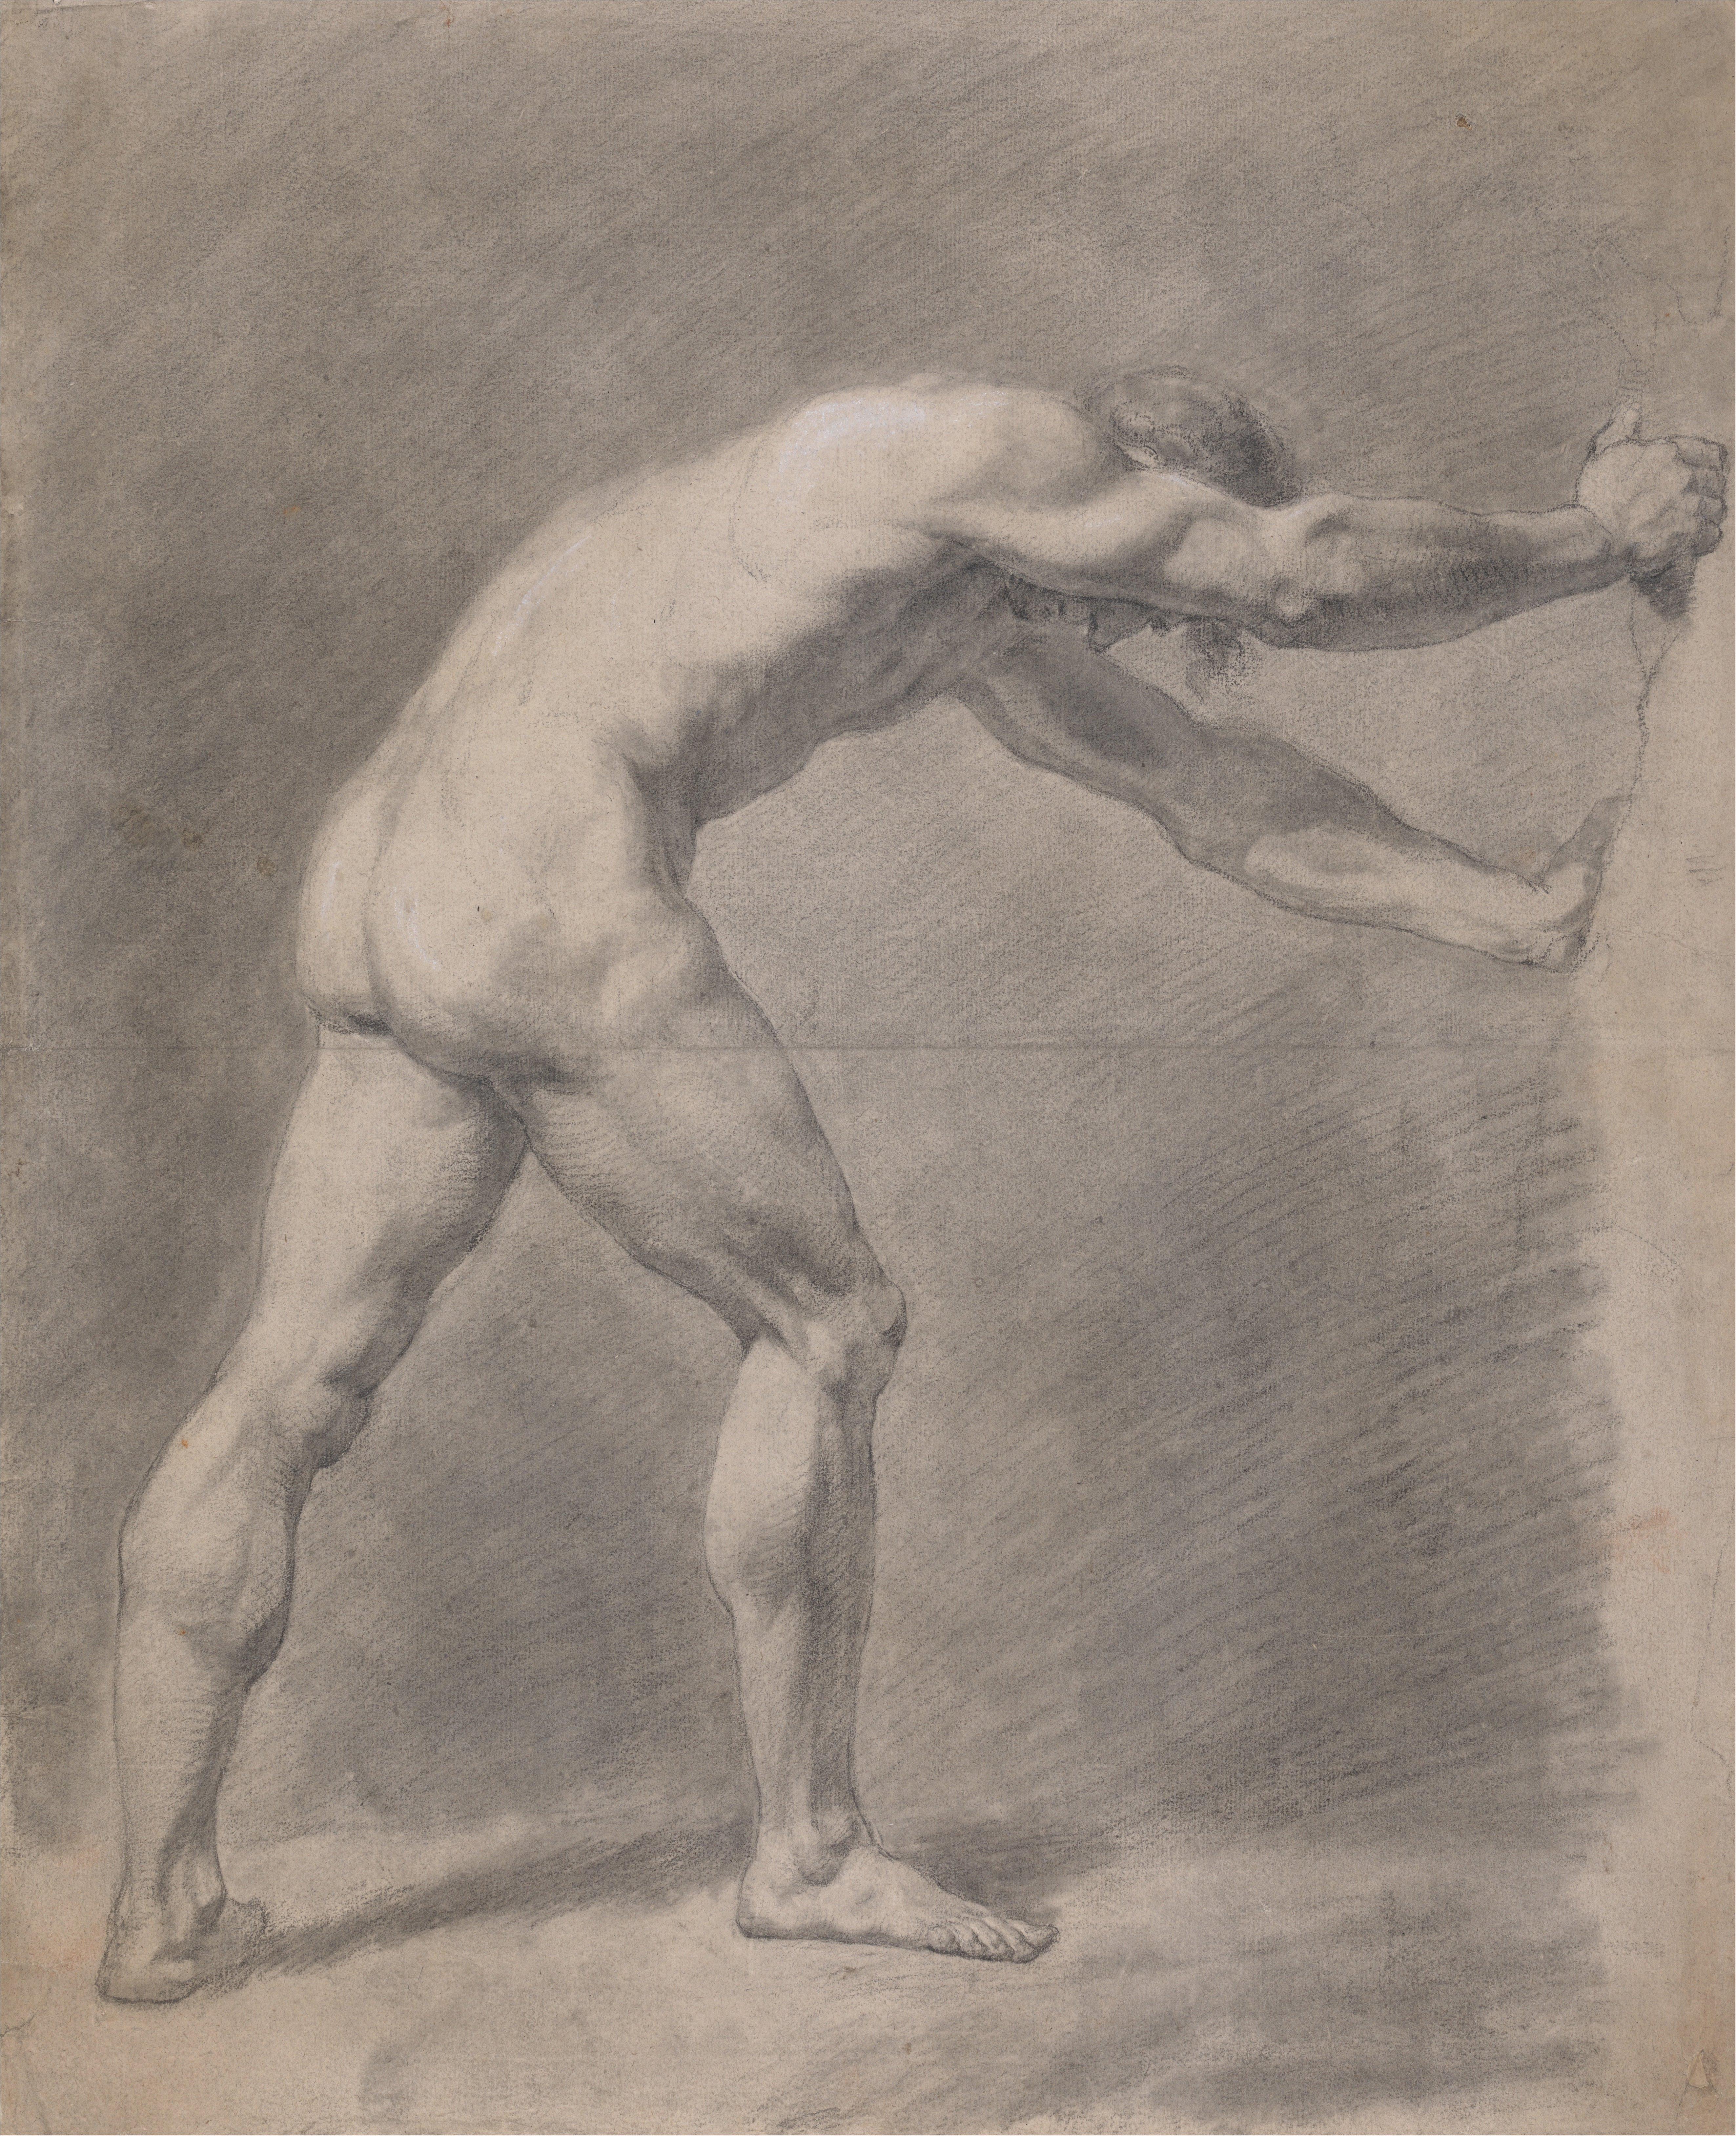 Opinion, error. nude art in history